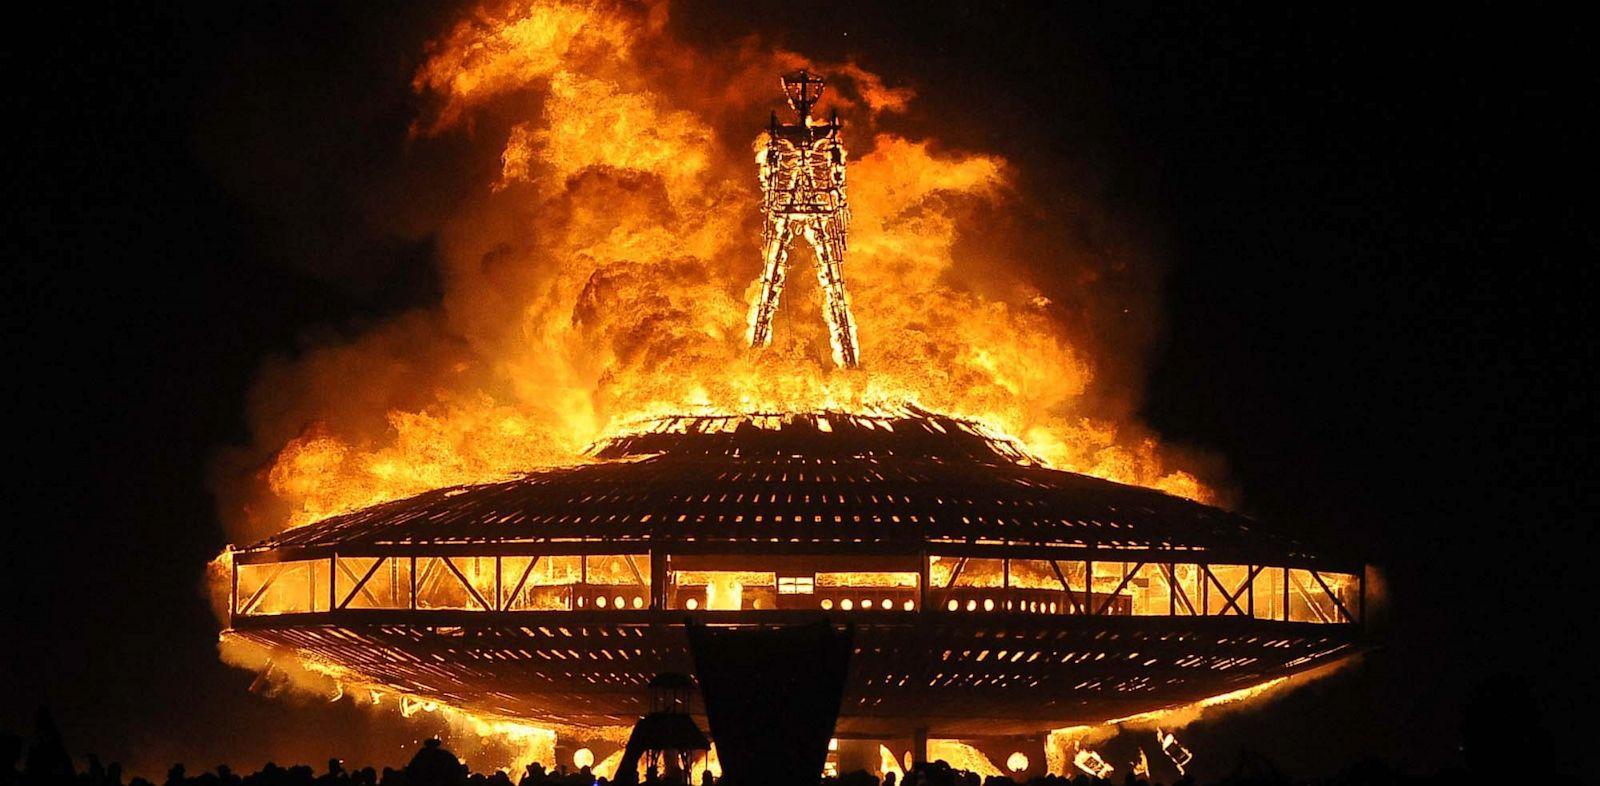 Burning Man. August 31st, 2013. Andy Barron/Reno Gazette-Journal/AP Photo